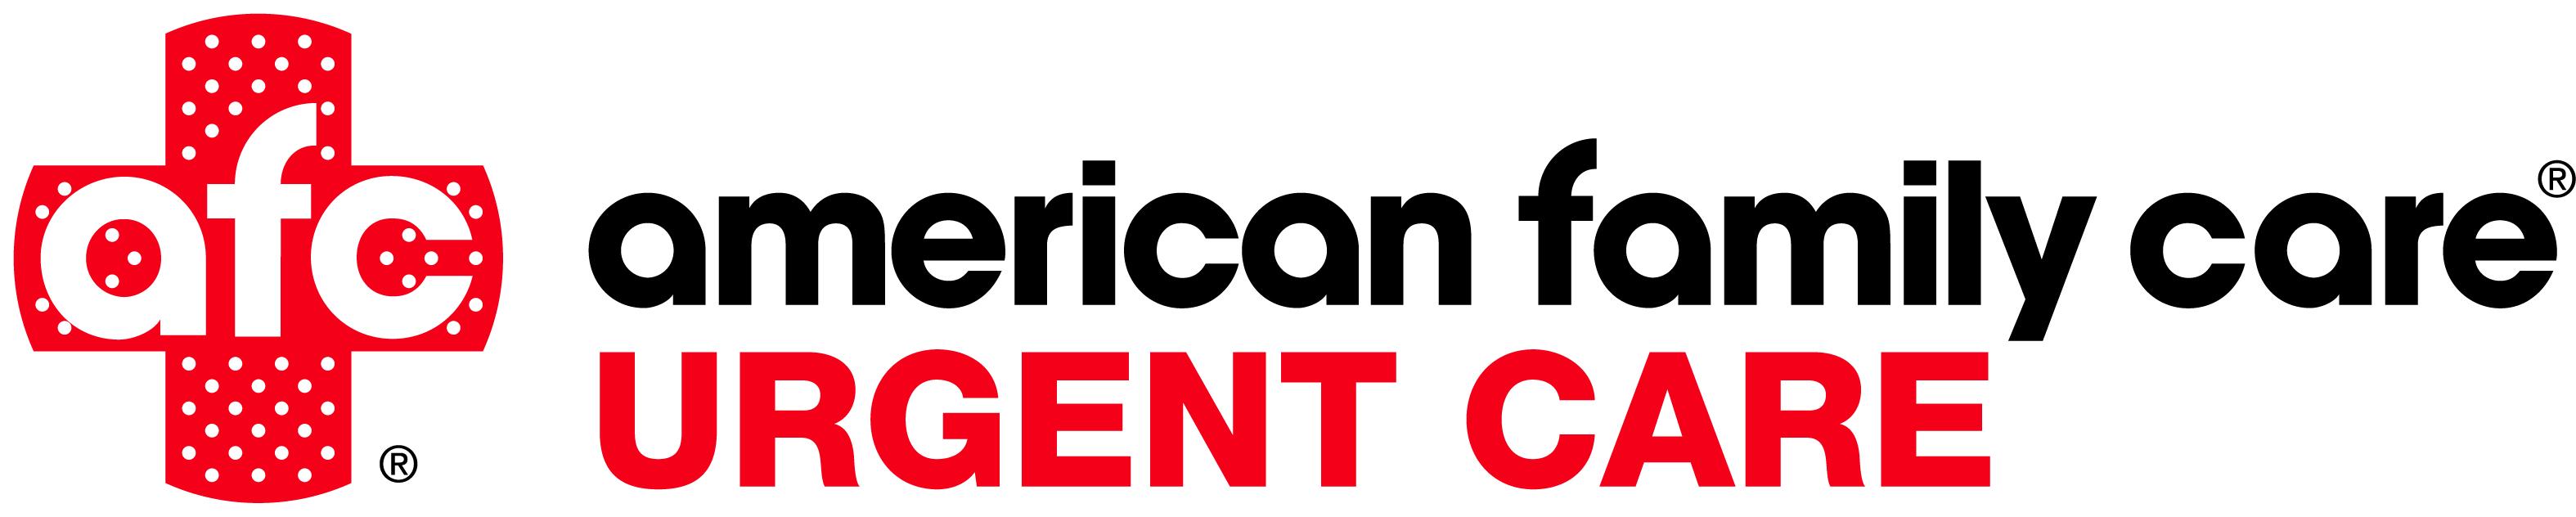 Afc urgent care logo horizontal  002